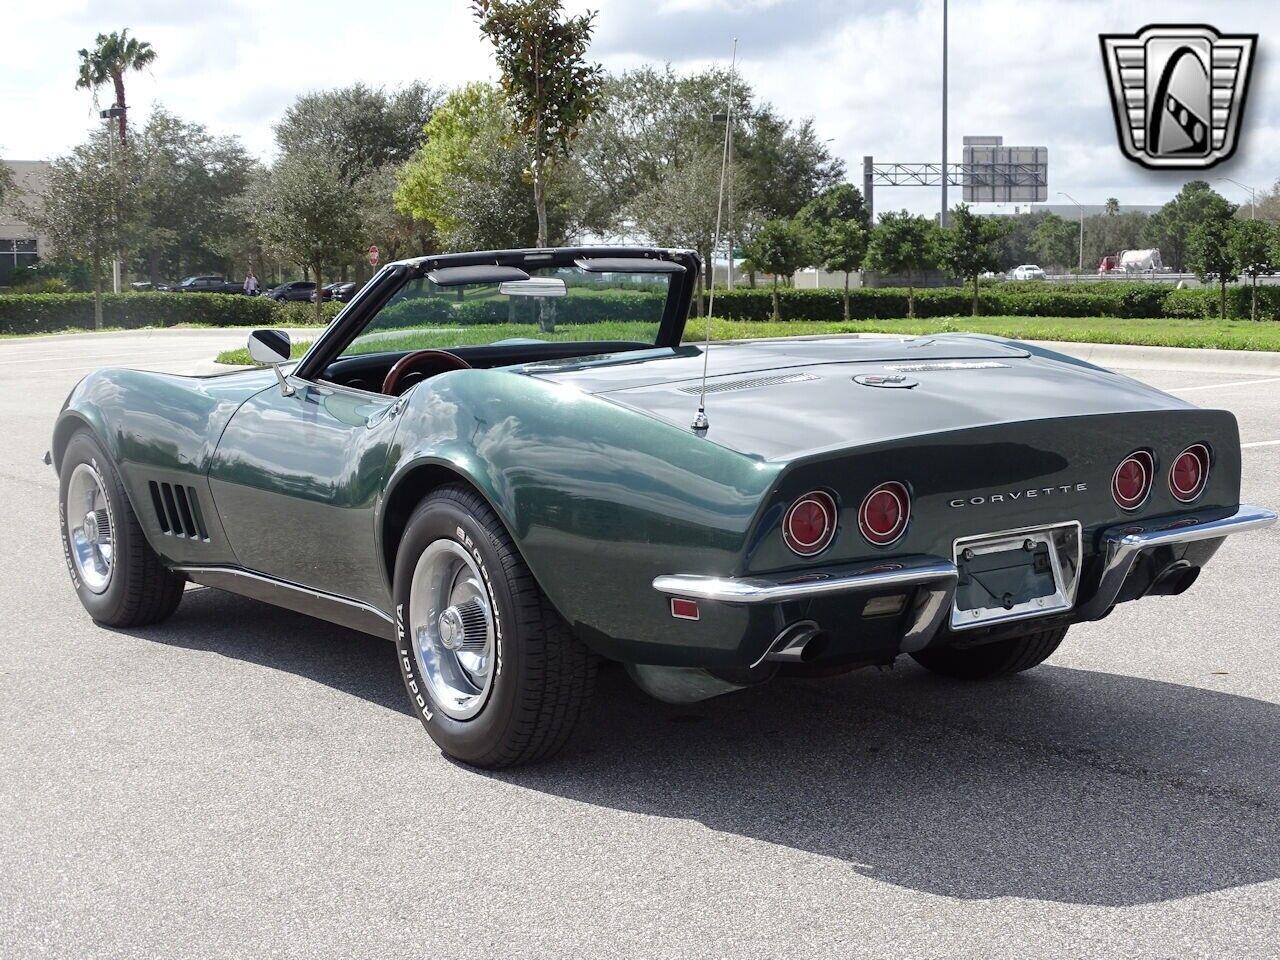 1968 Green Chevrolet Corvette   | C3 Corvette Photo 7